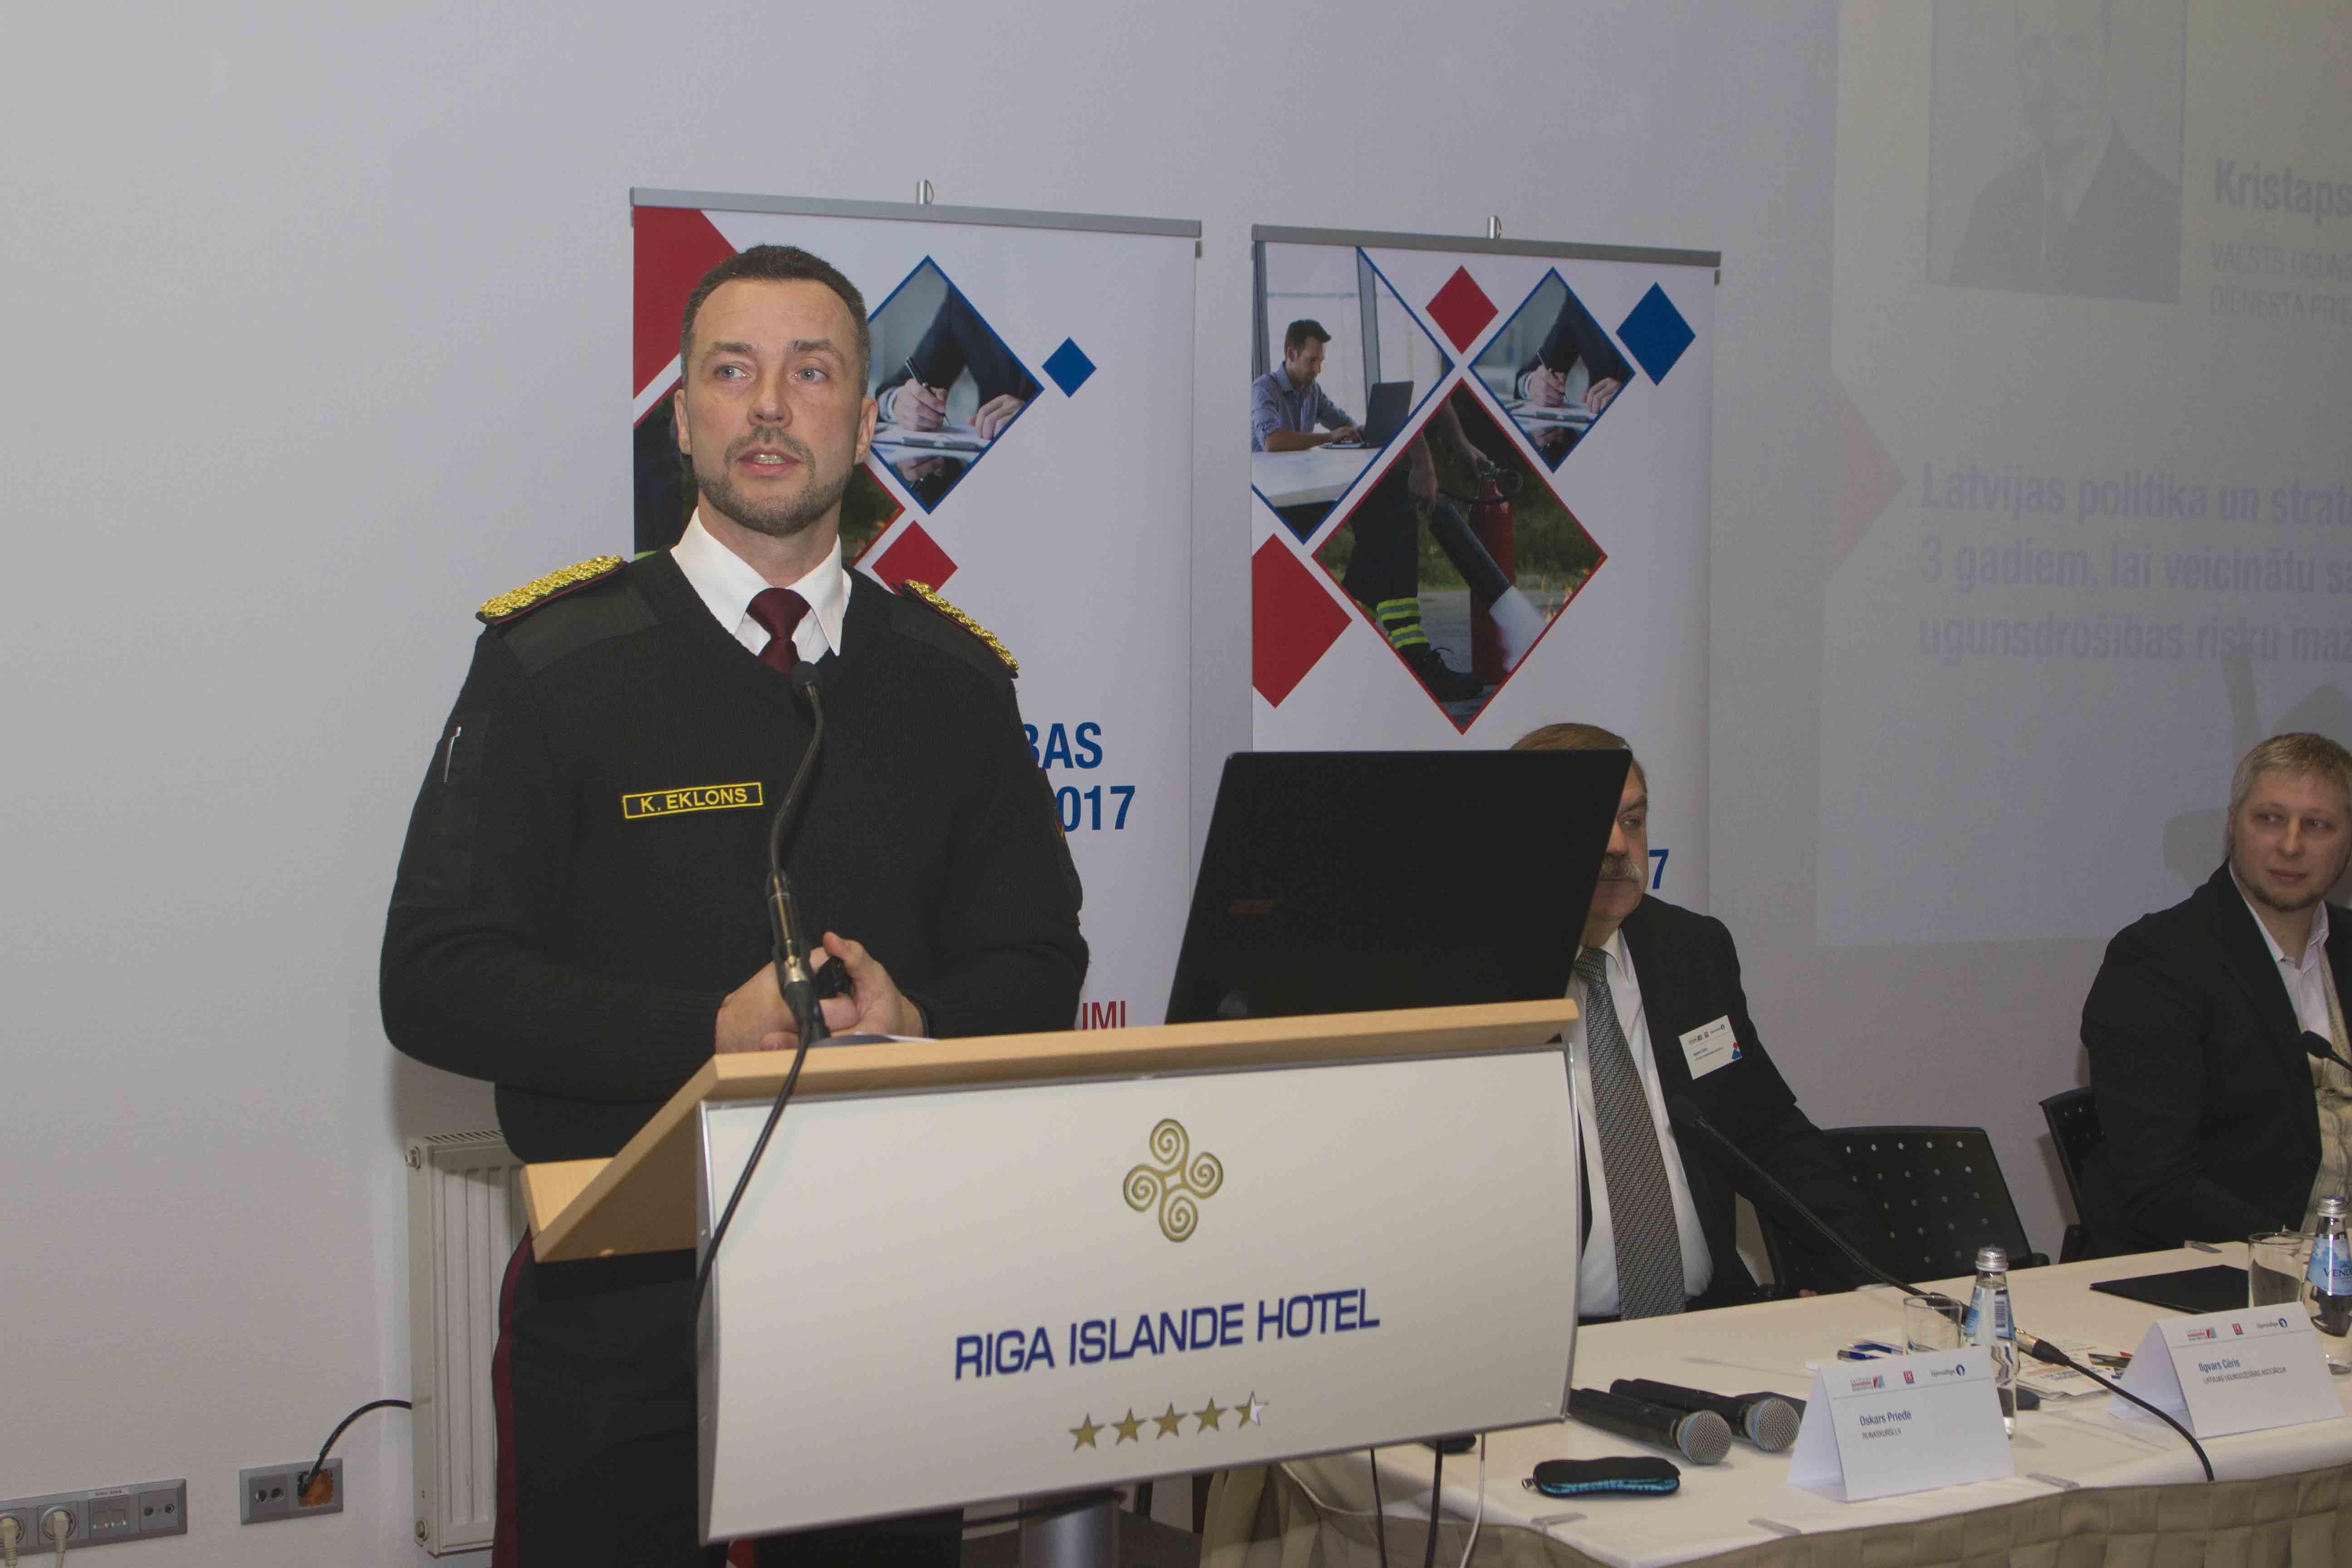 Lapa fn serviss ugunsdrošības konference 2017